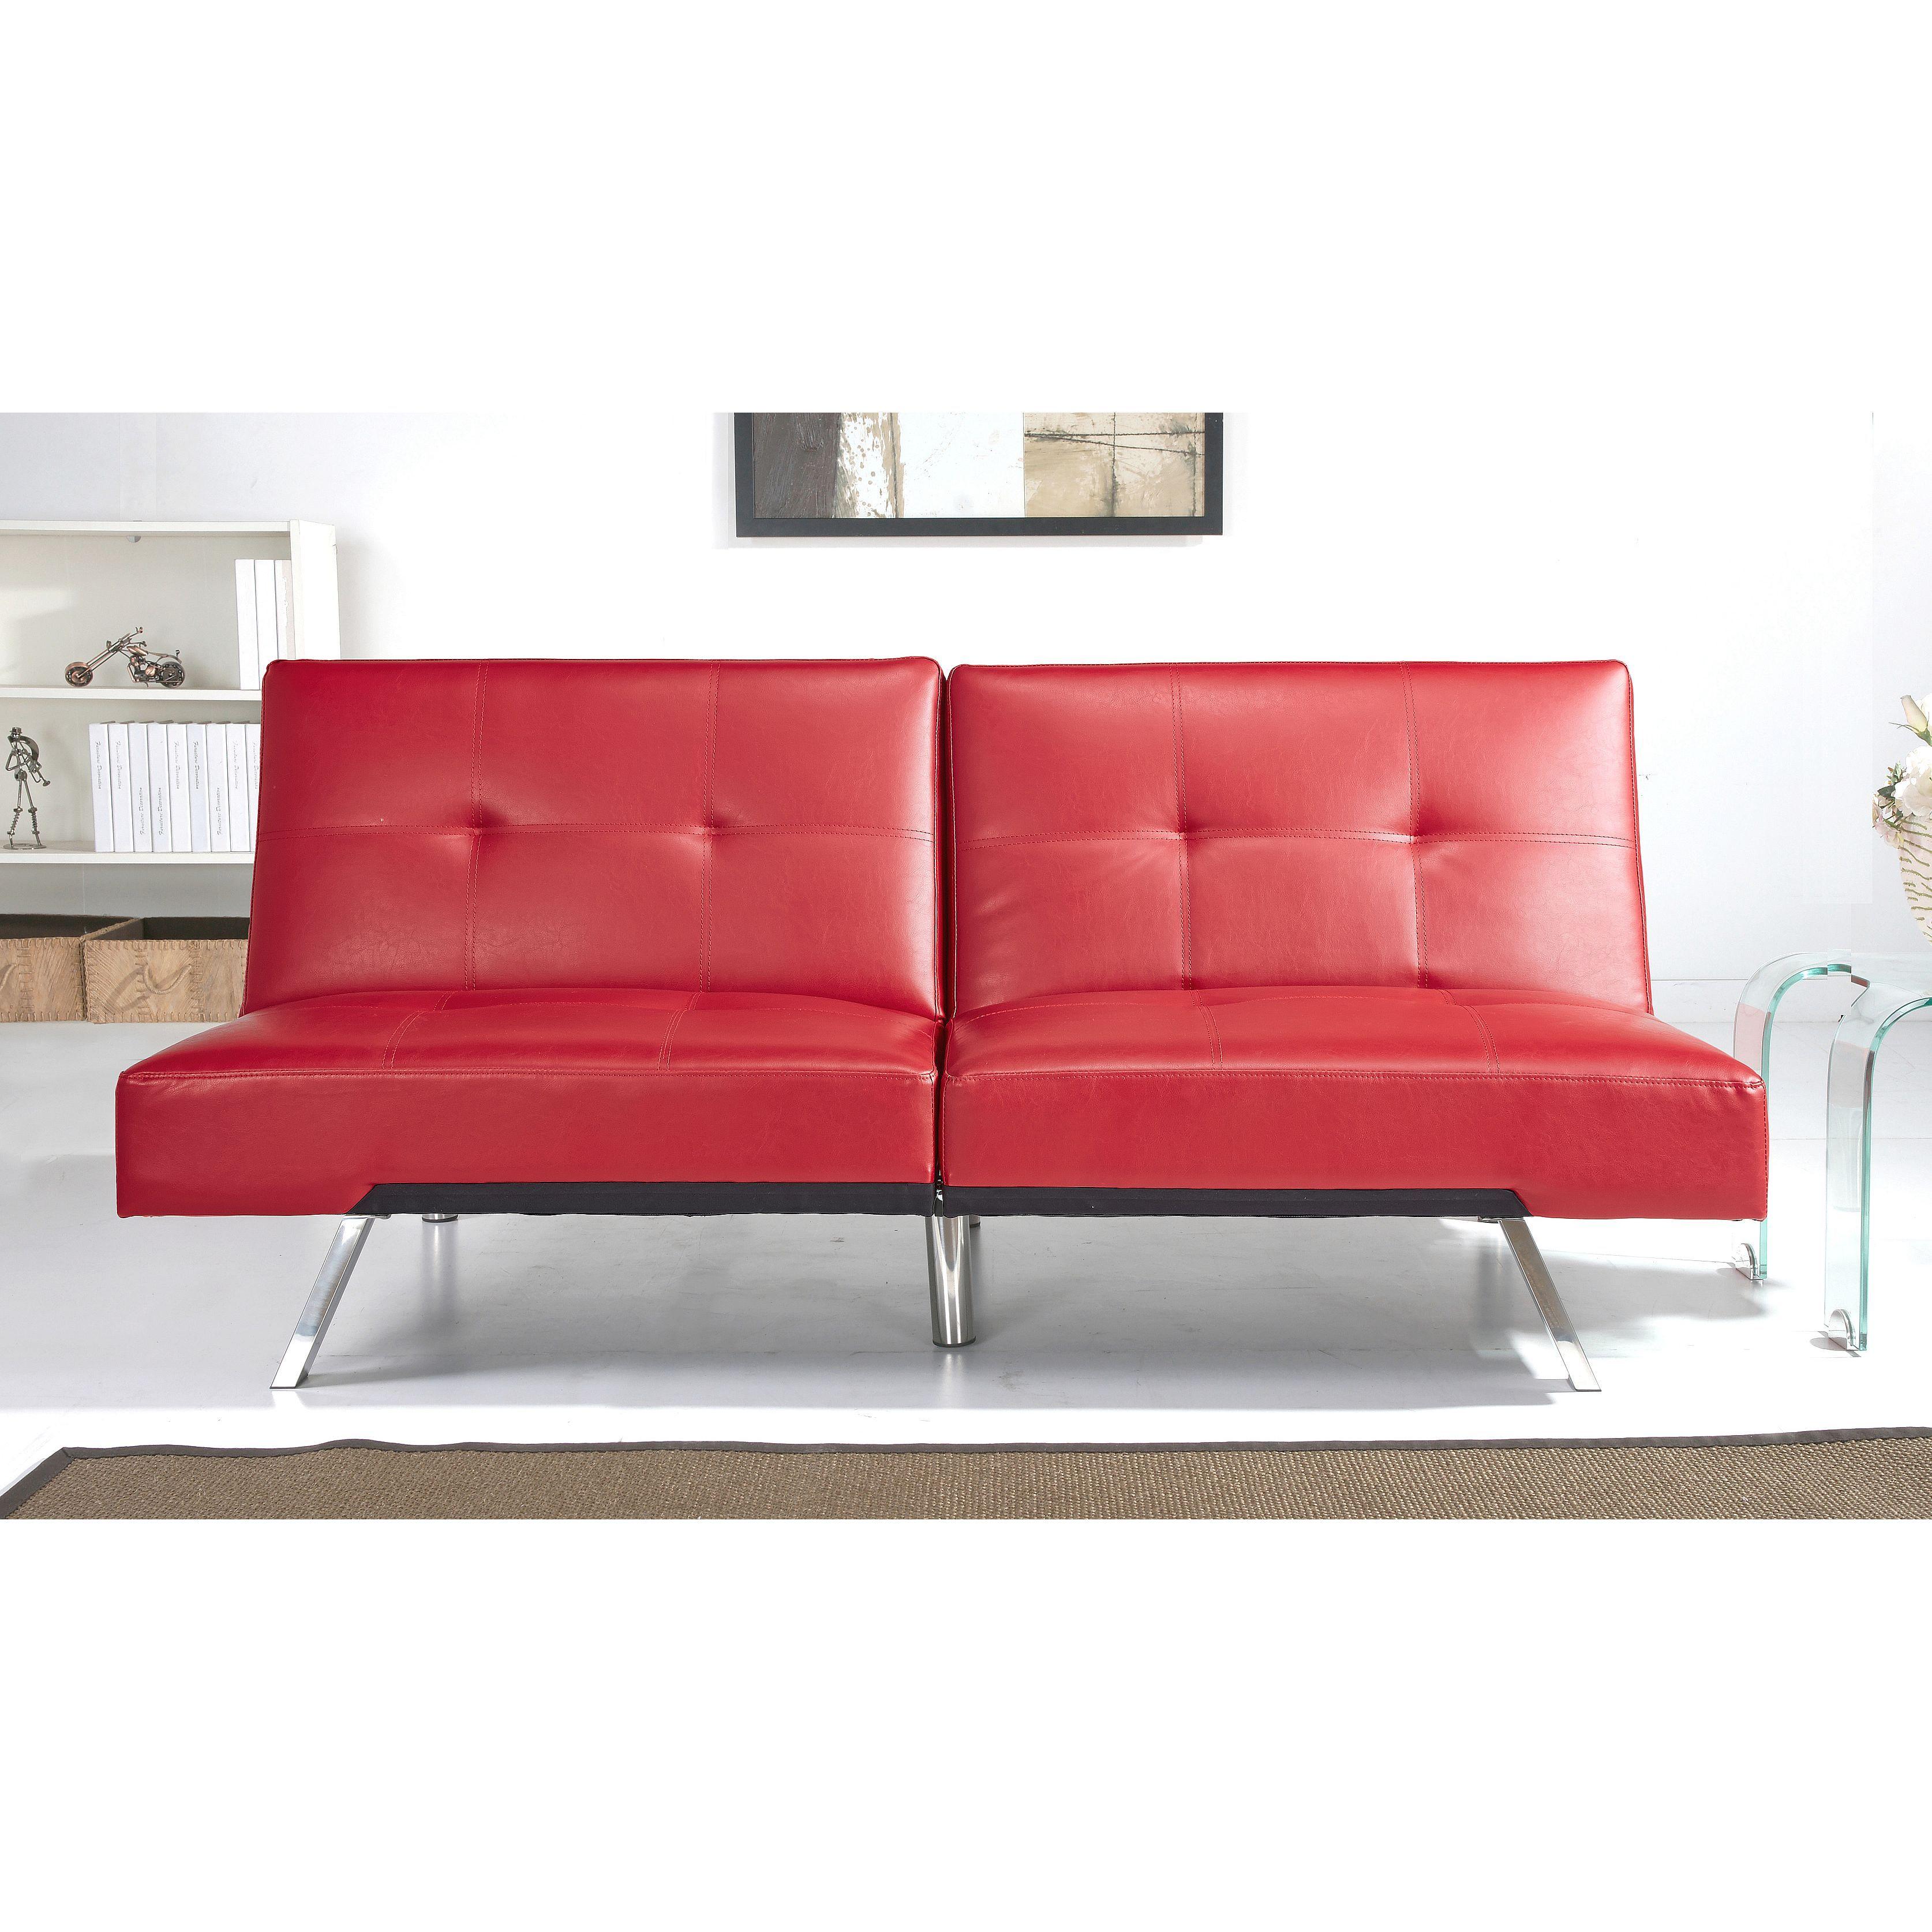 abbyson living aspen red leather foldable futon sleeper sofa bed   overstock shopping   great deals abbyson living aspen red leather foldable futon sleeper sofa bed      rh   pinterest